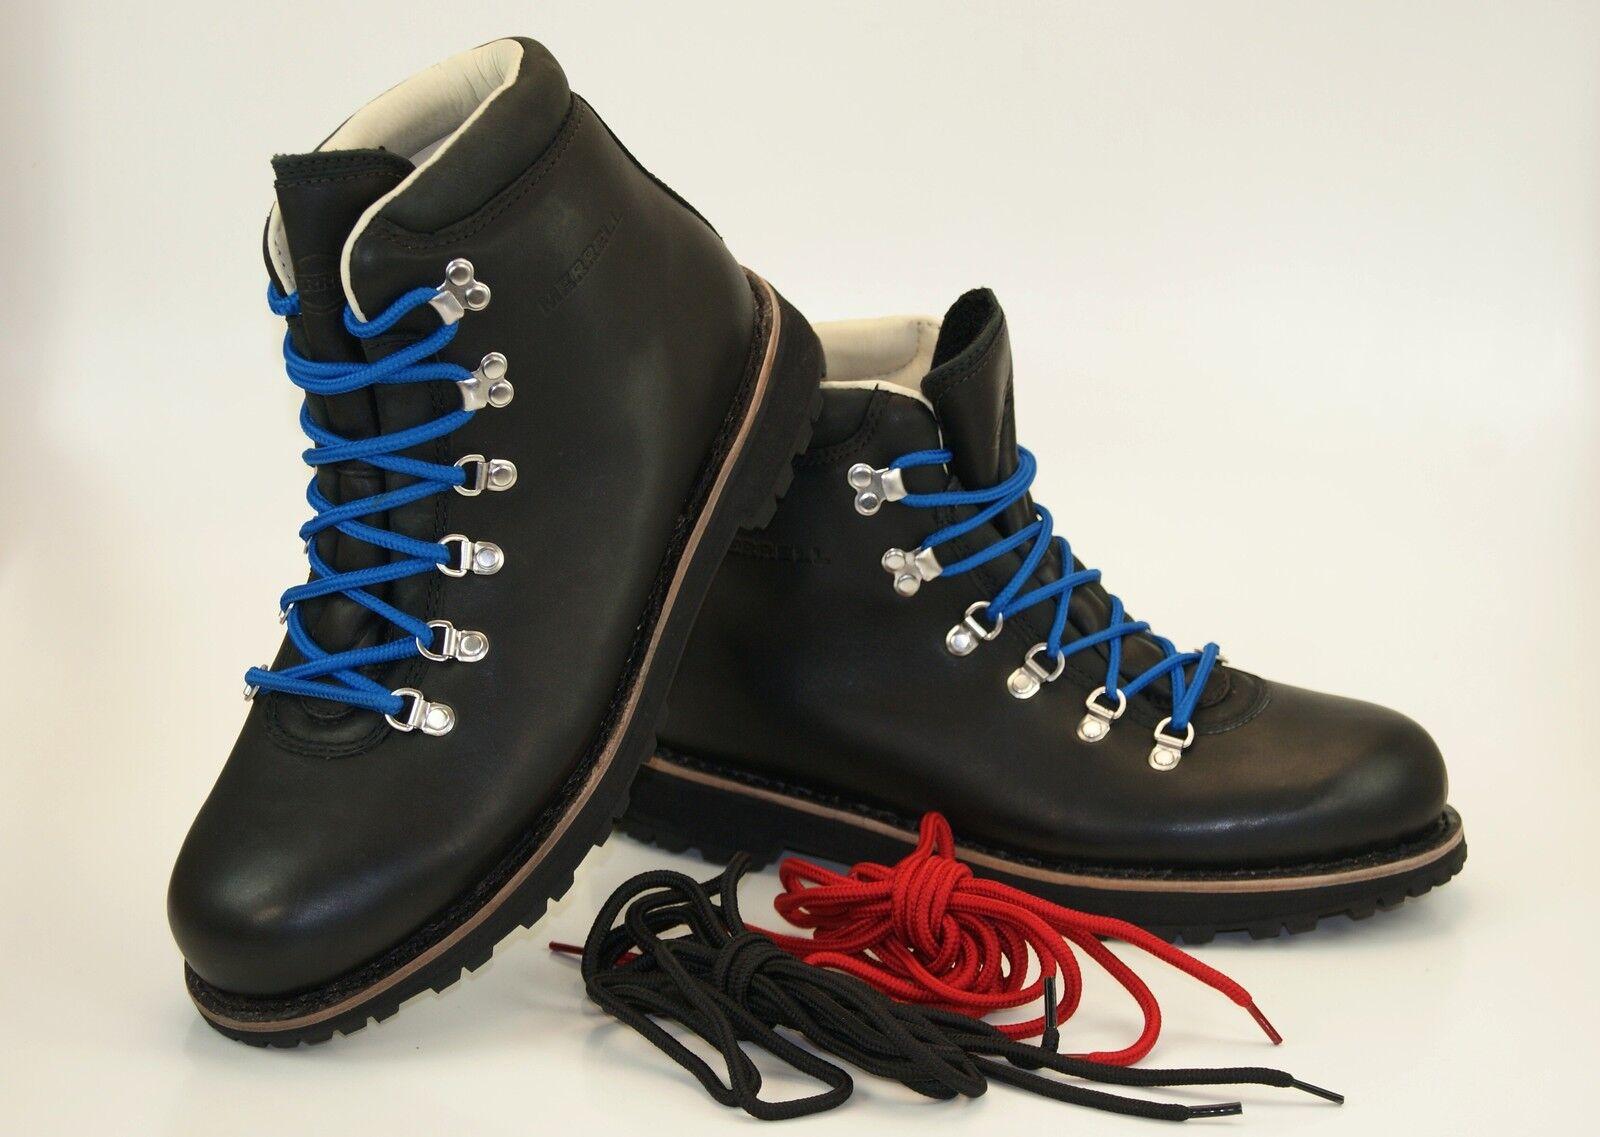 Merrell Wilderness Canyon Stiefel Schuhe Wanderstiefel Wanderschuhe Herren Schuhe Stiefel J15301 361f49